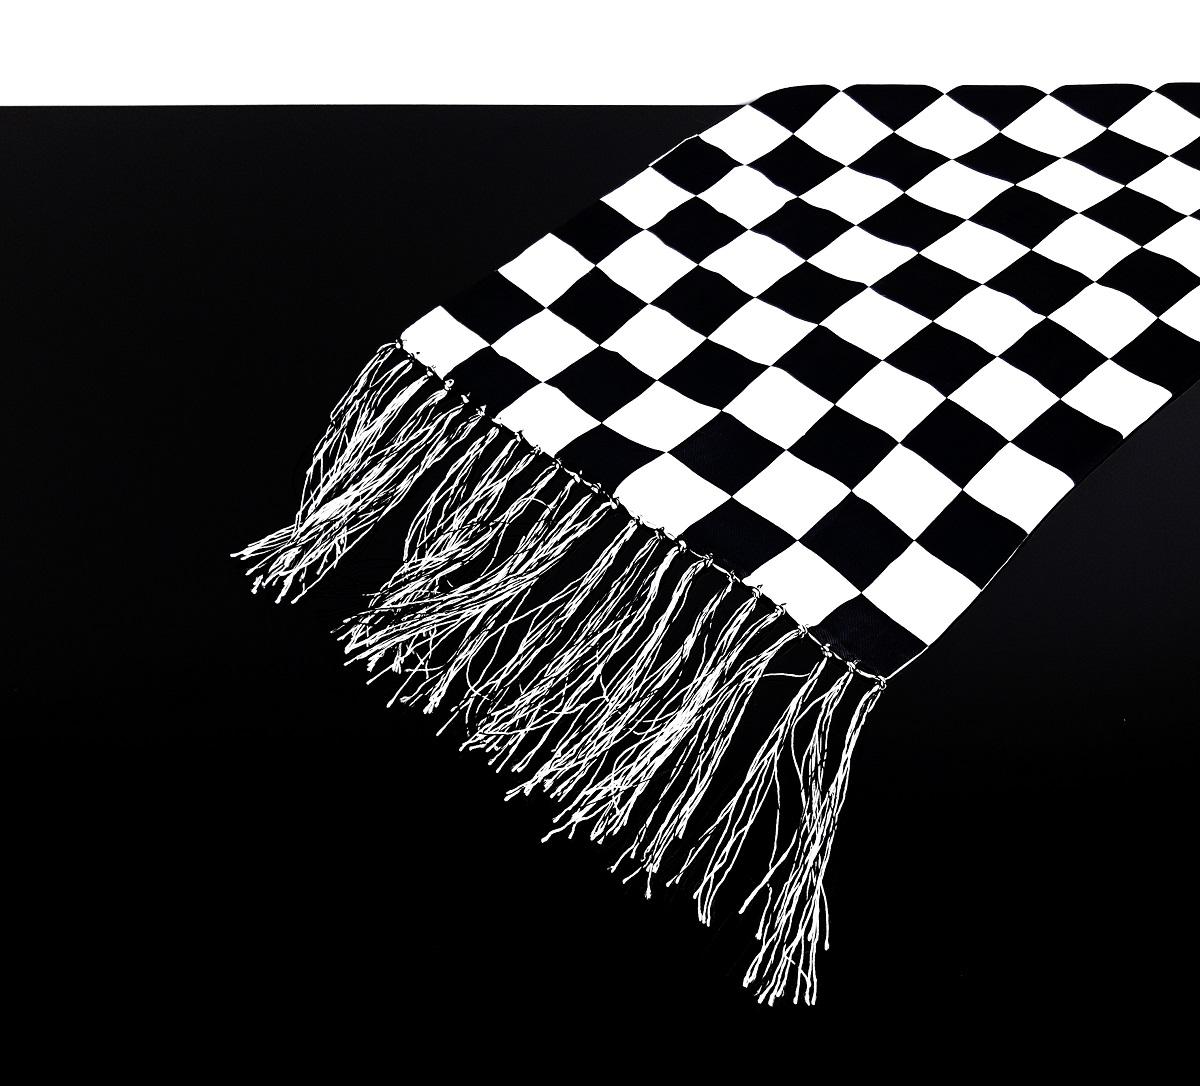 cafe racer schal tuch schwarz wei chequered flag karos 100 seide sh scf. Black Bedroom Furniture Sets. Home Design Ideas